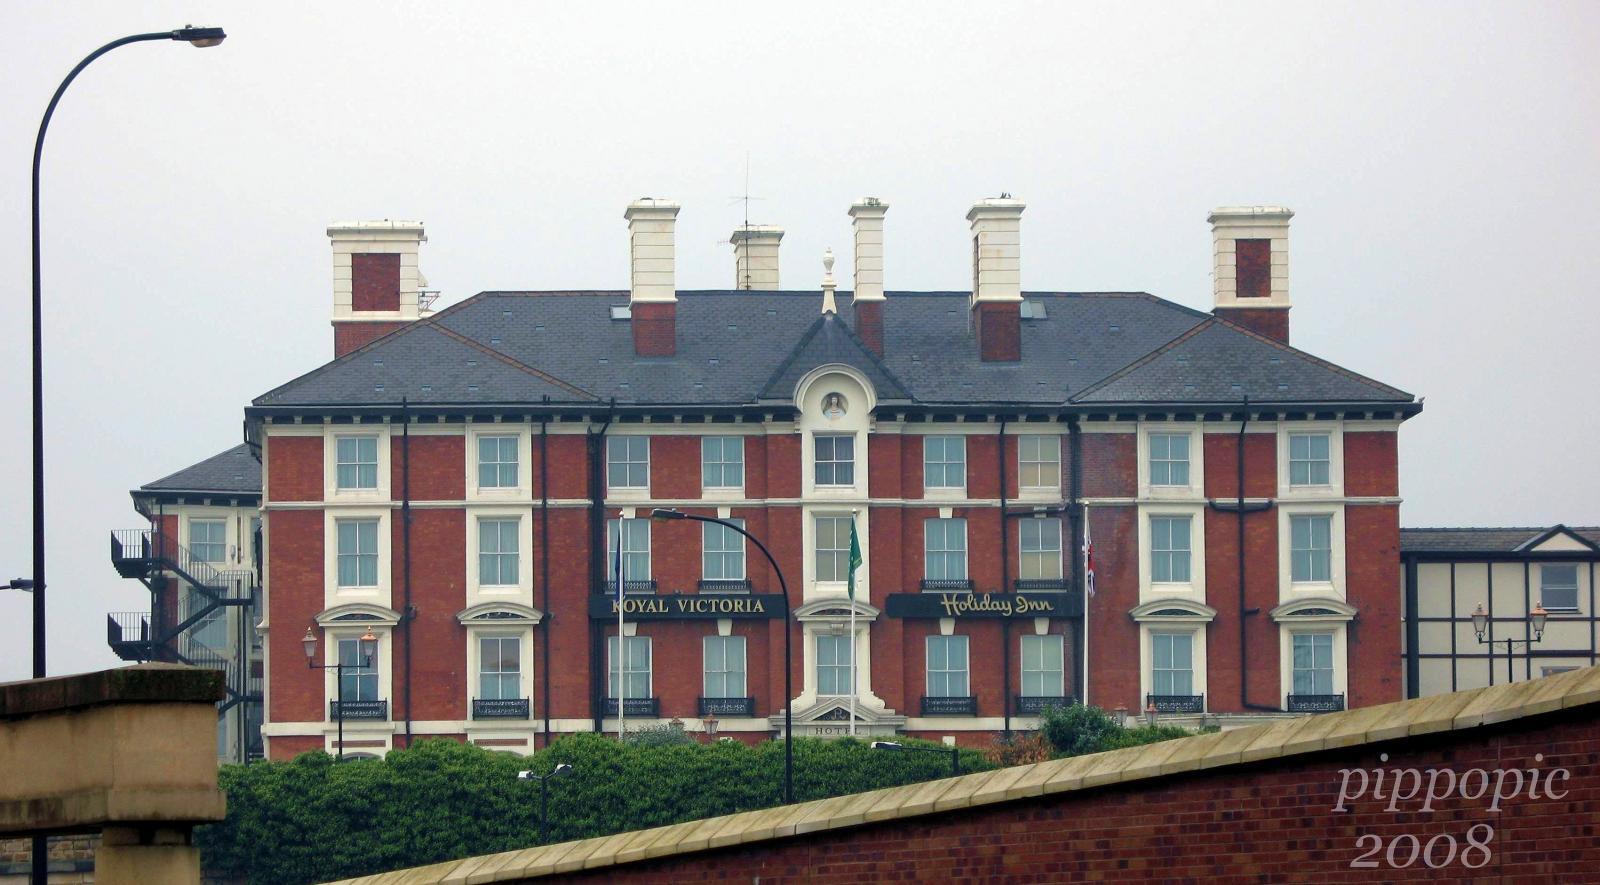 Royal Victoria Hotel/Holiday Inn